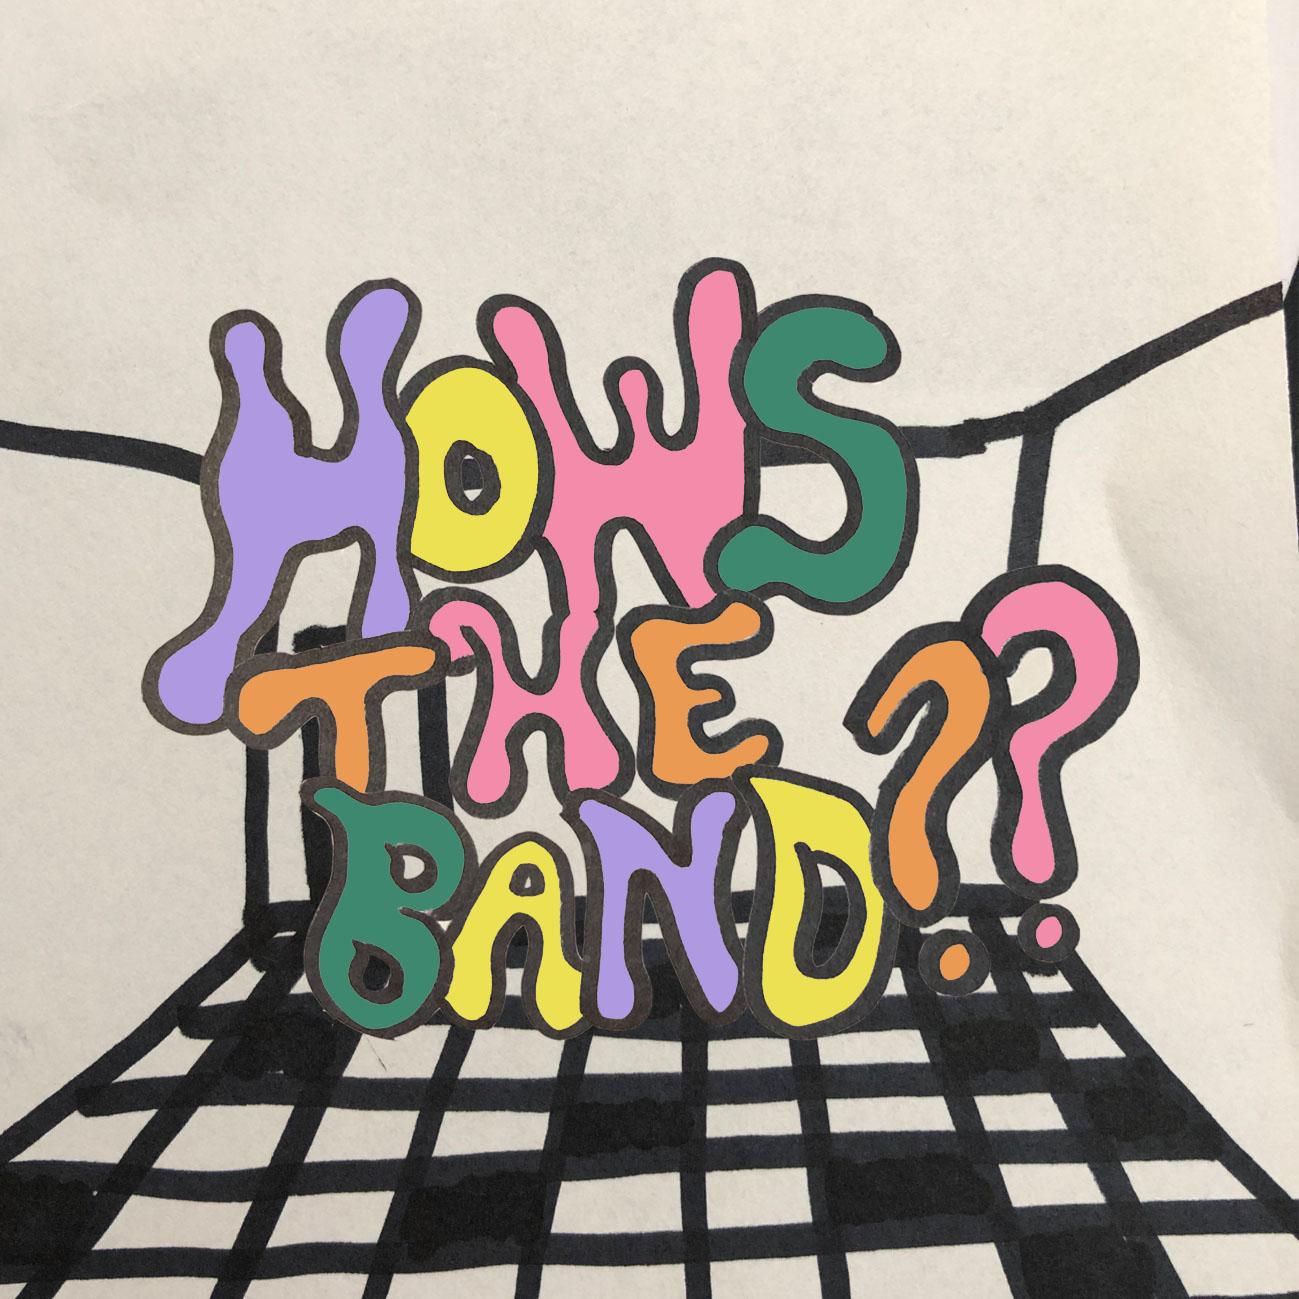 The Big Punk Show - Episode 26: The Ballad of Bent Legs